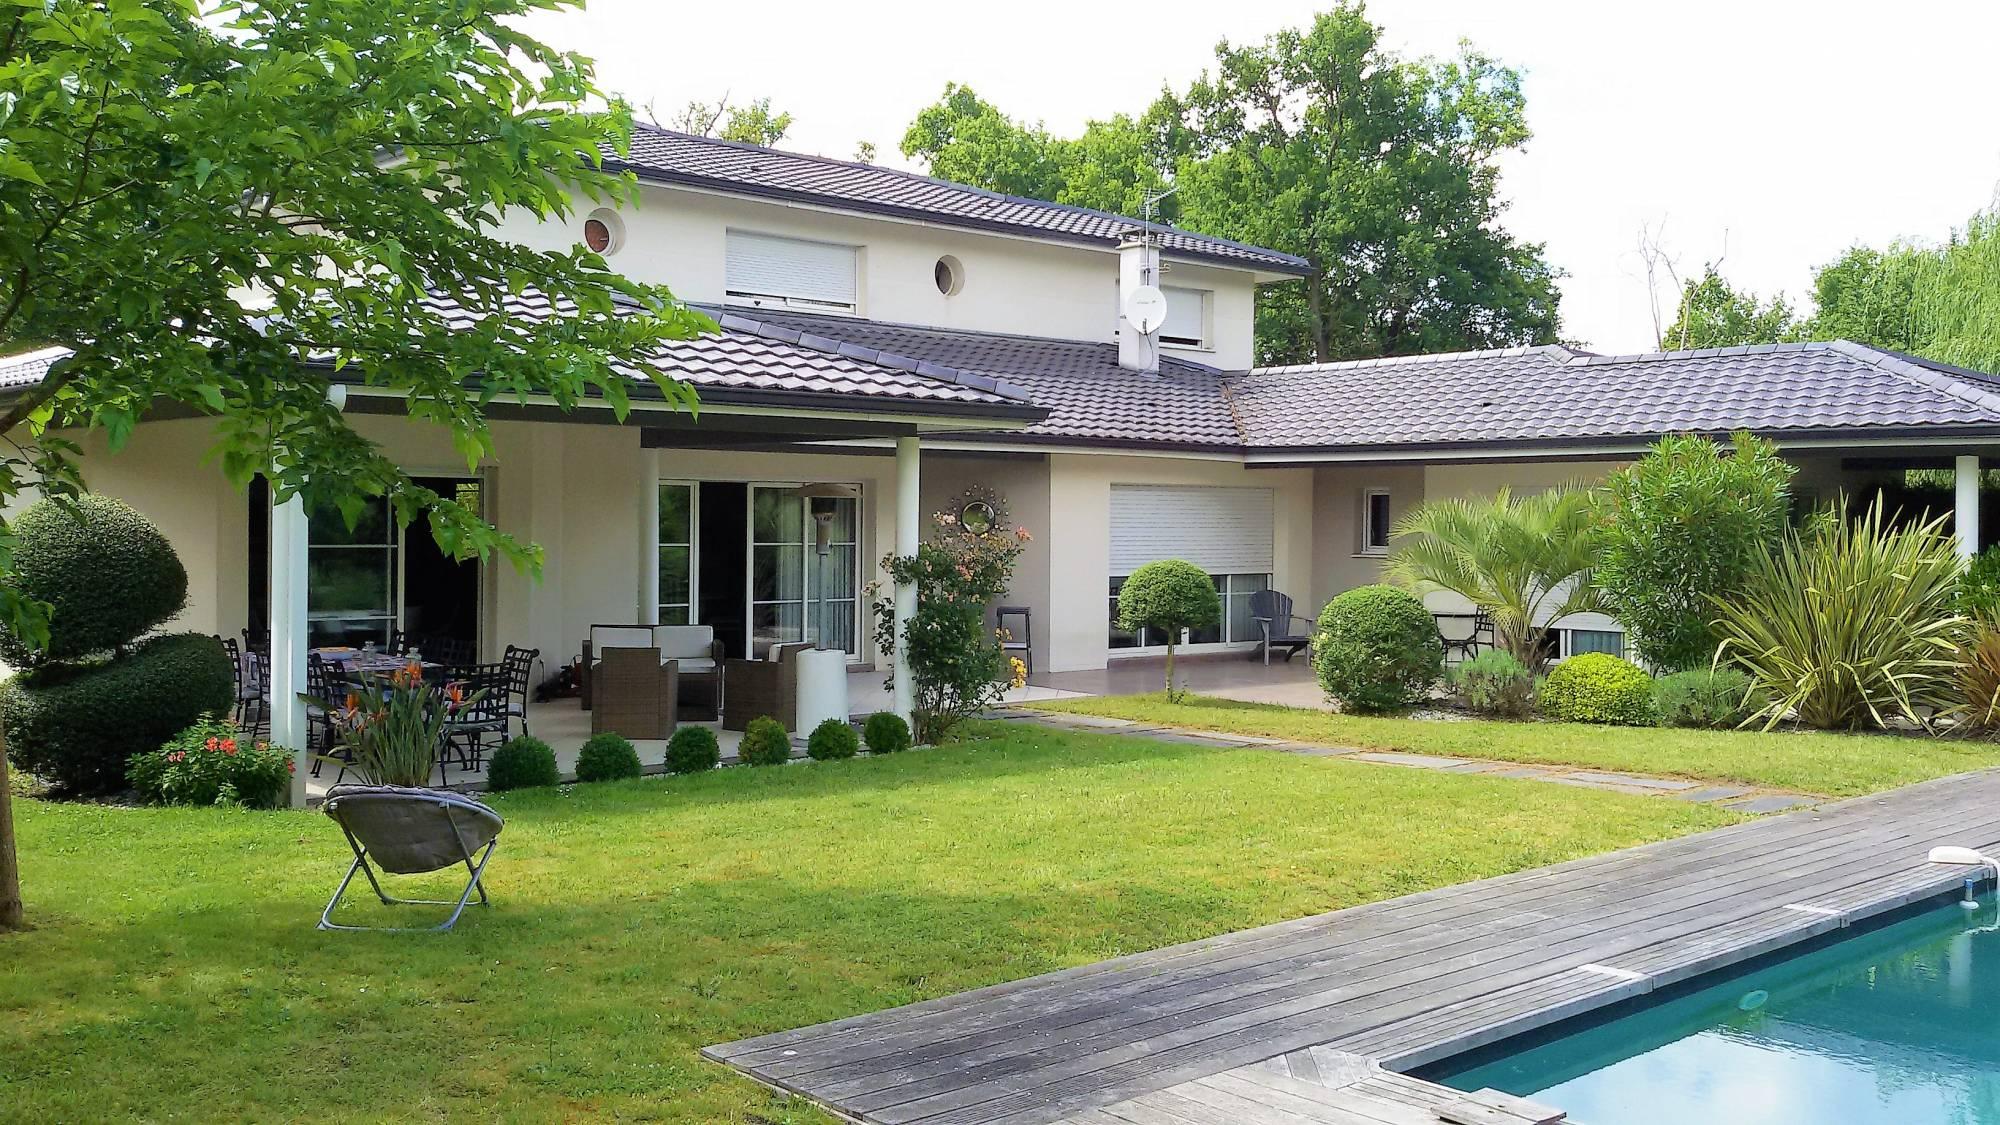 Maison moderne avec jardin - Recherche maison a louer avec jardin ...